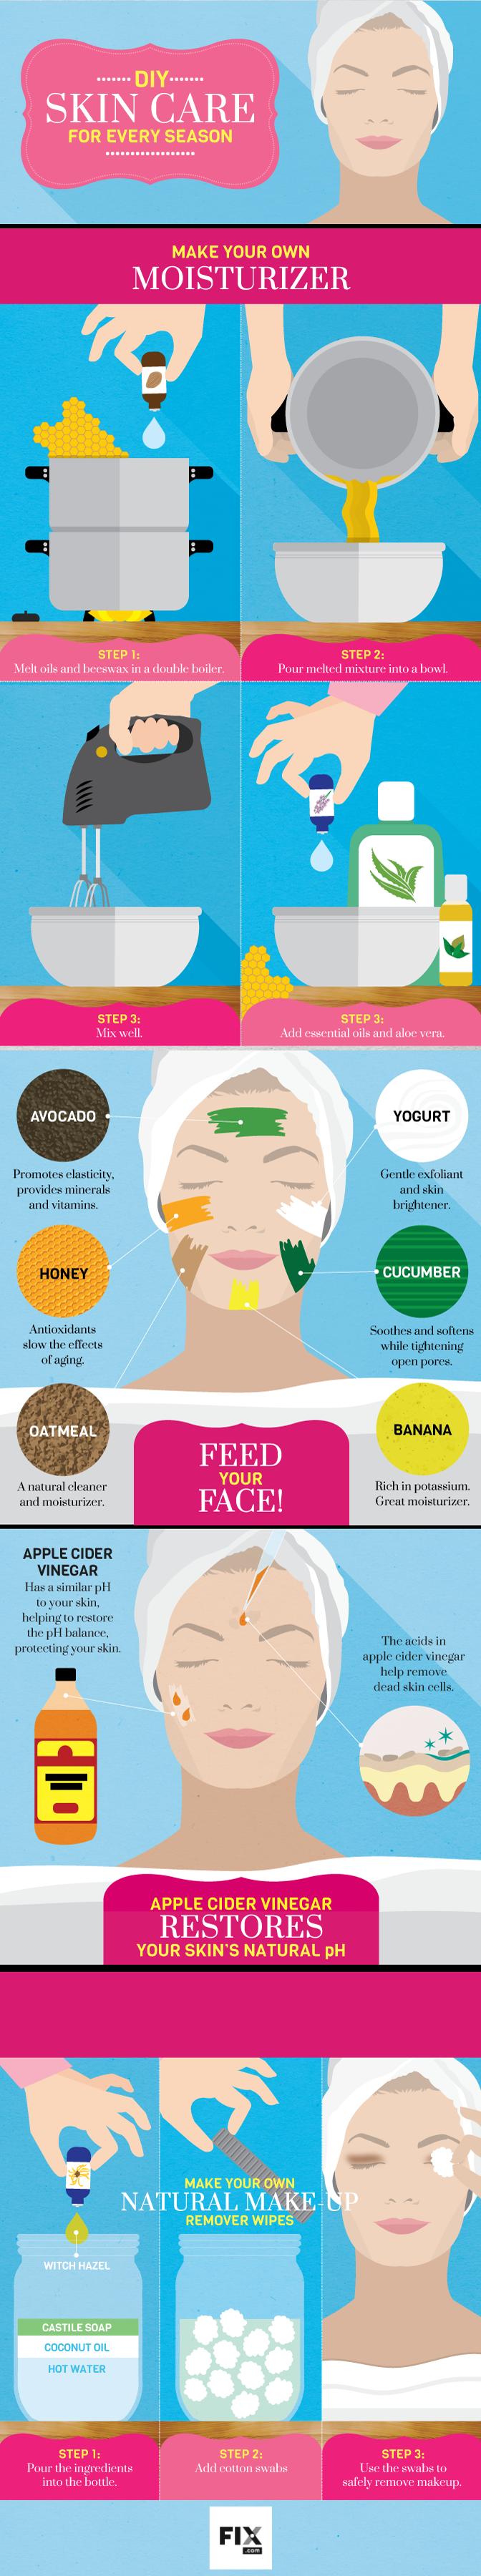 DIY Skin Care for Every Season